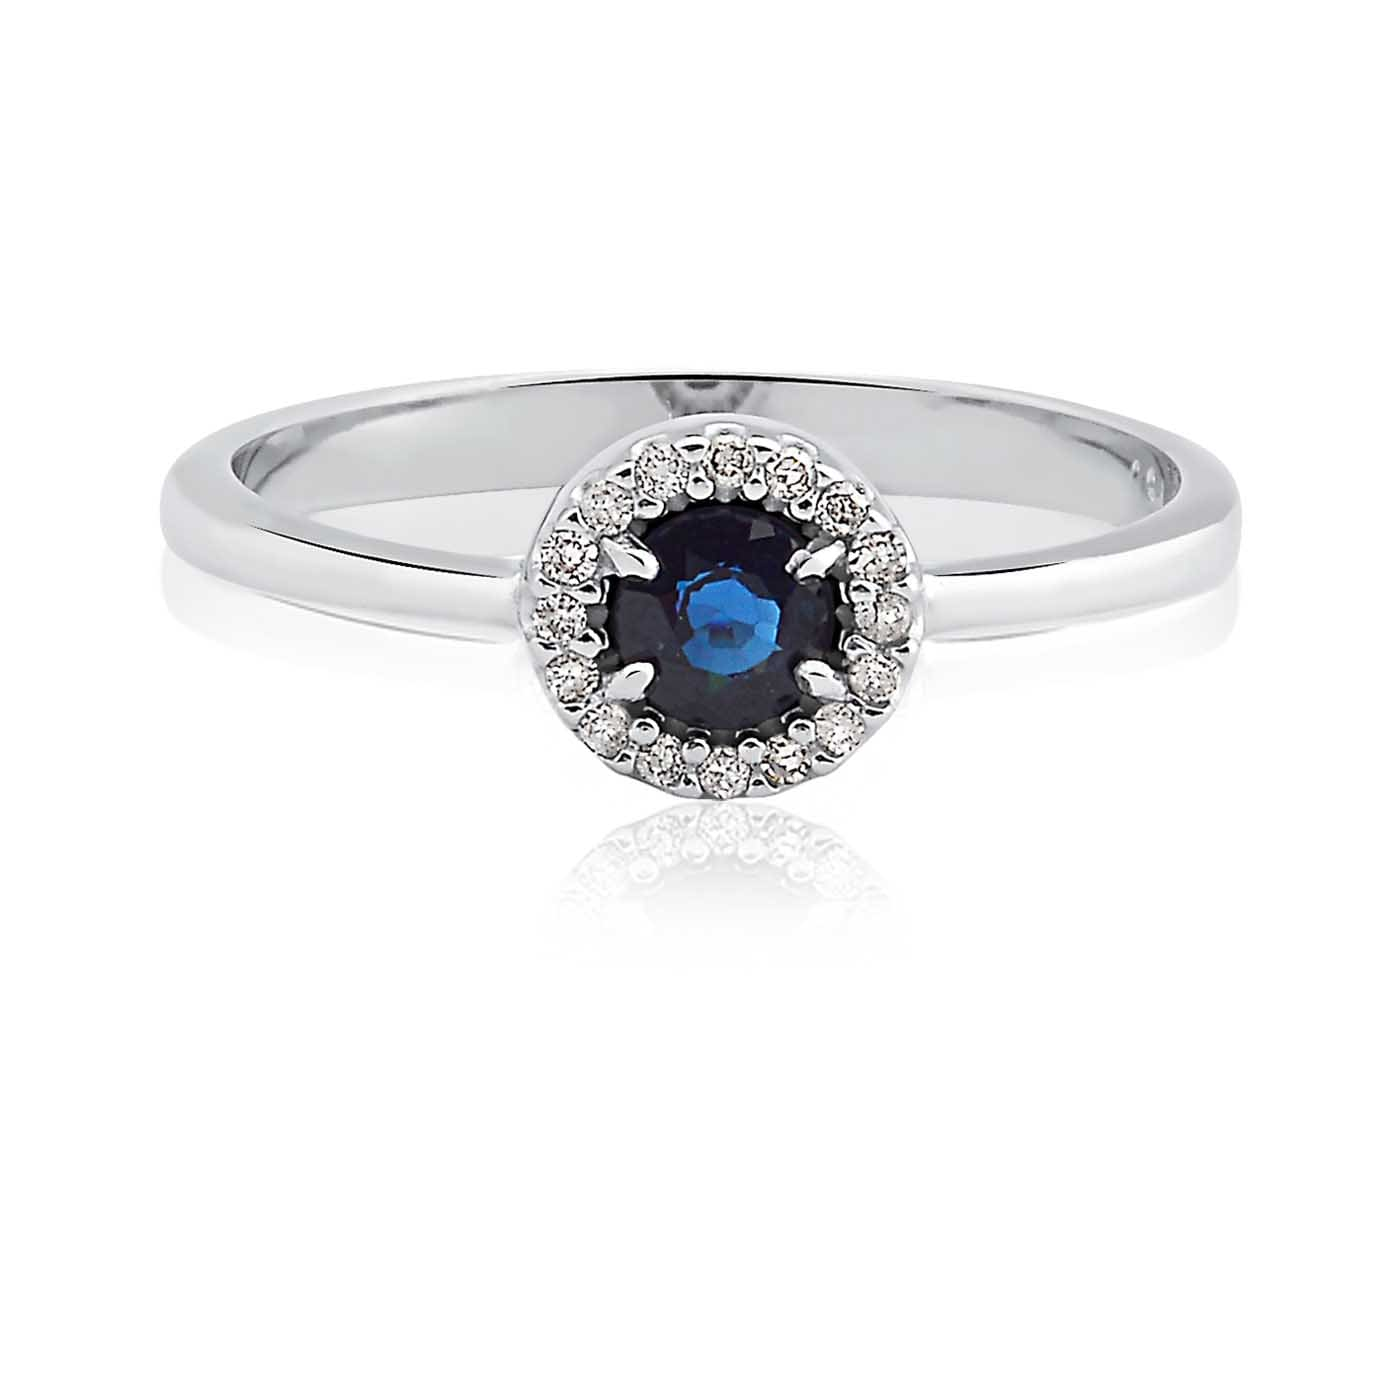 8ec1cbbaa81 Anel Ouro Branco Diamantes e Safira - Colecao Classic Oriental